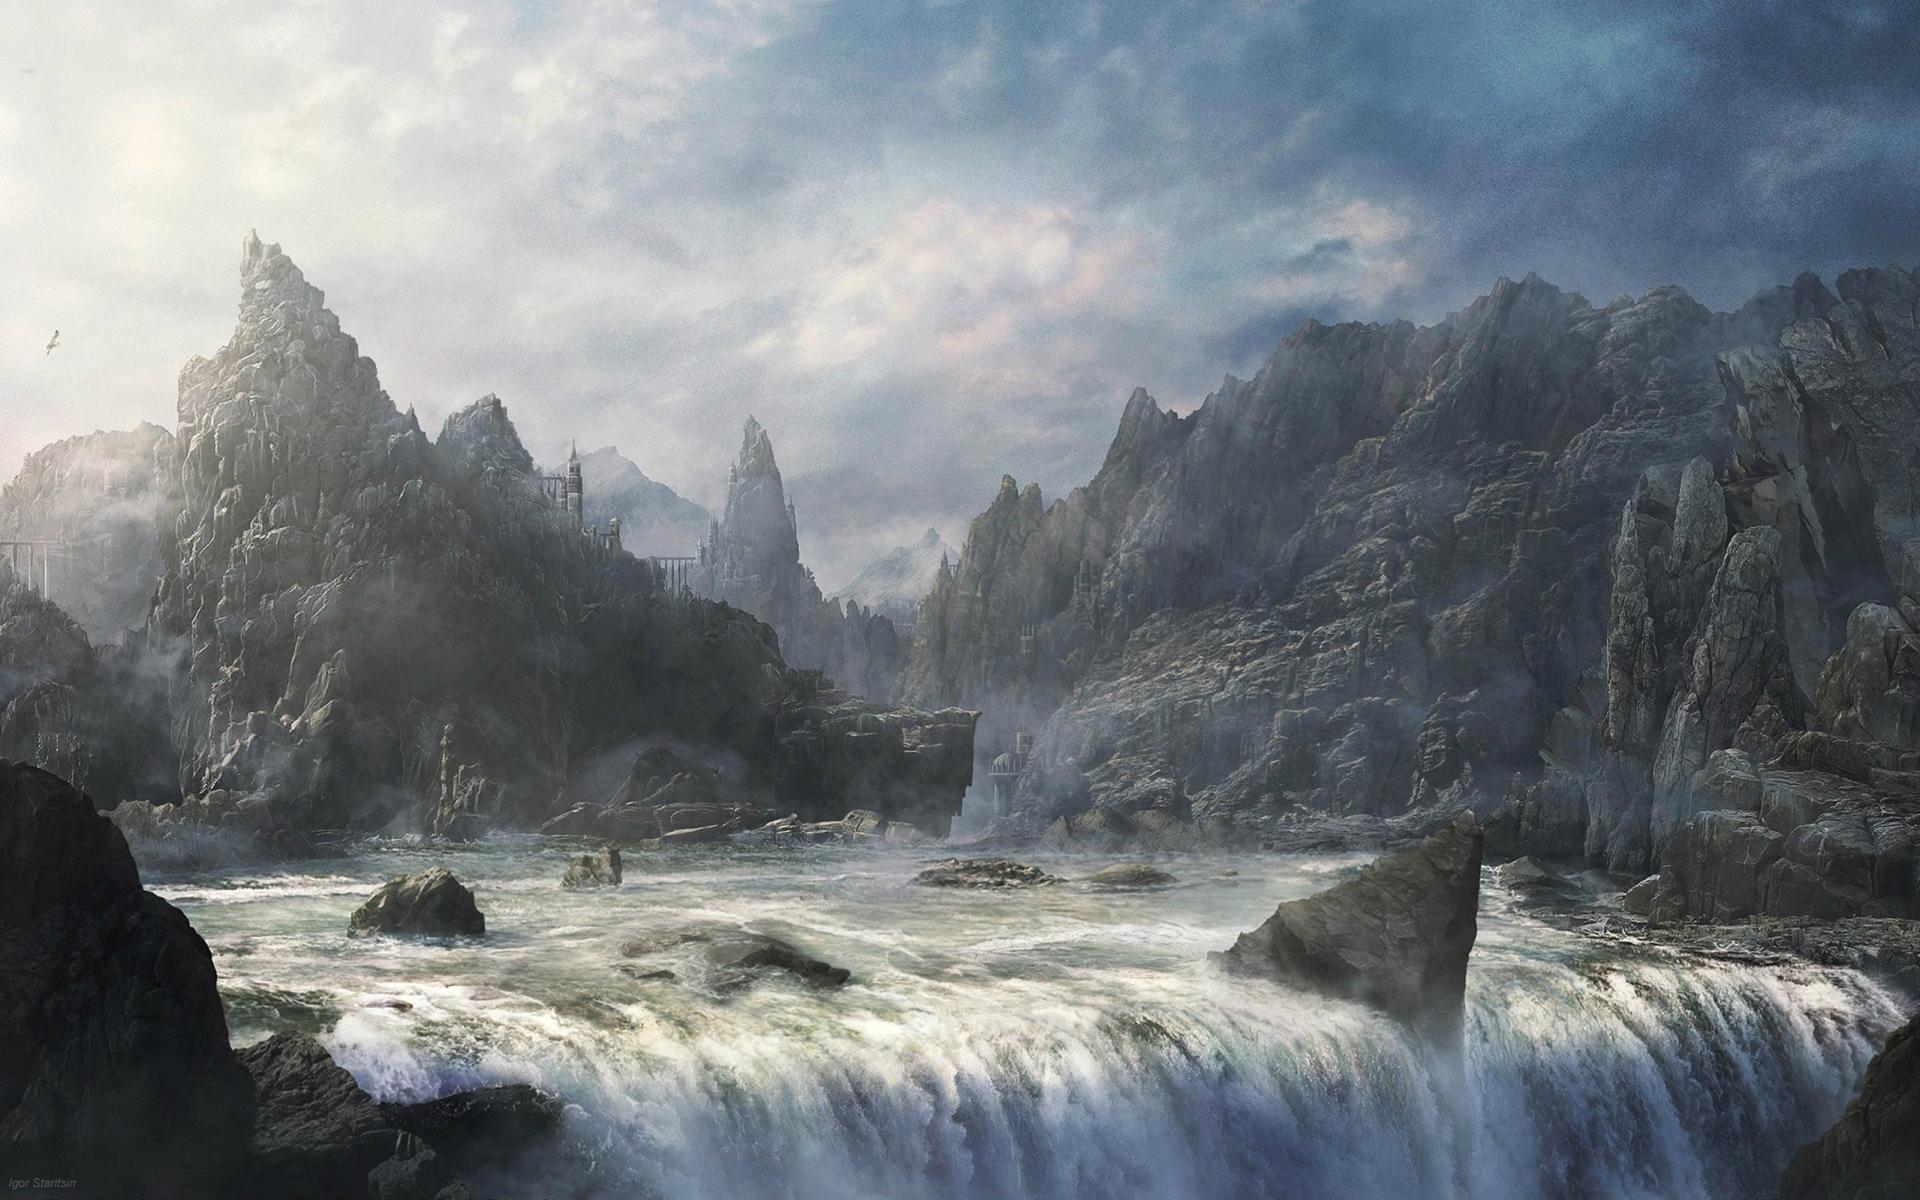 Top Wallpaper Mountain Fantasy - e4522731a777360792b25d1e726fb285  Perfect Image Reference_439783.jpg